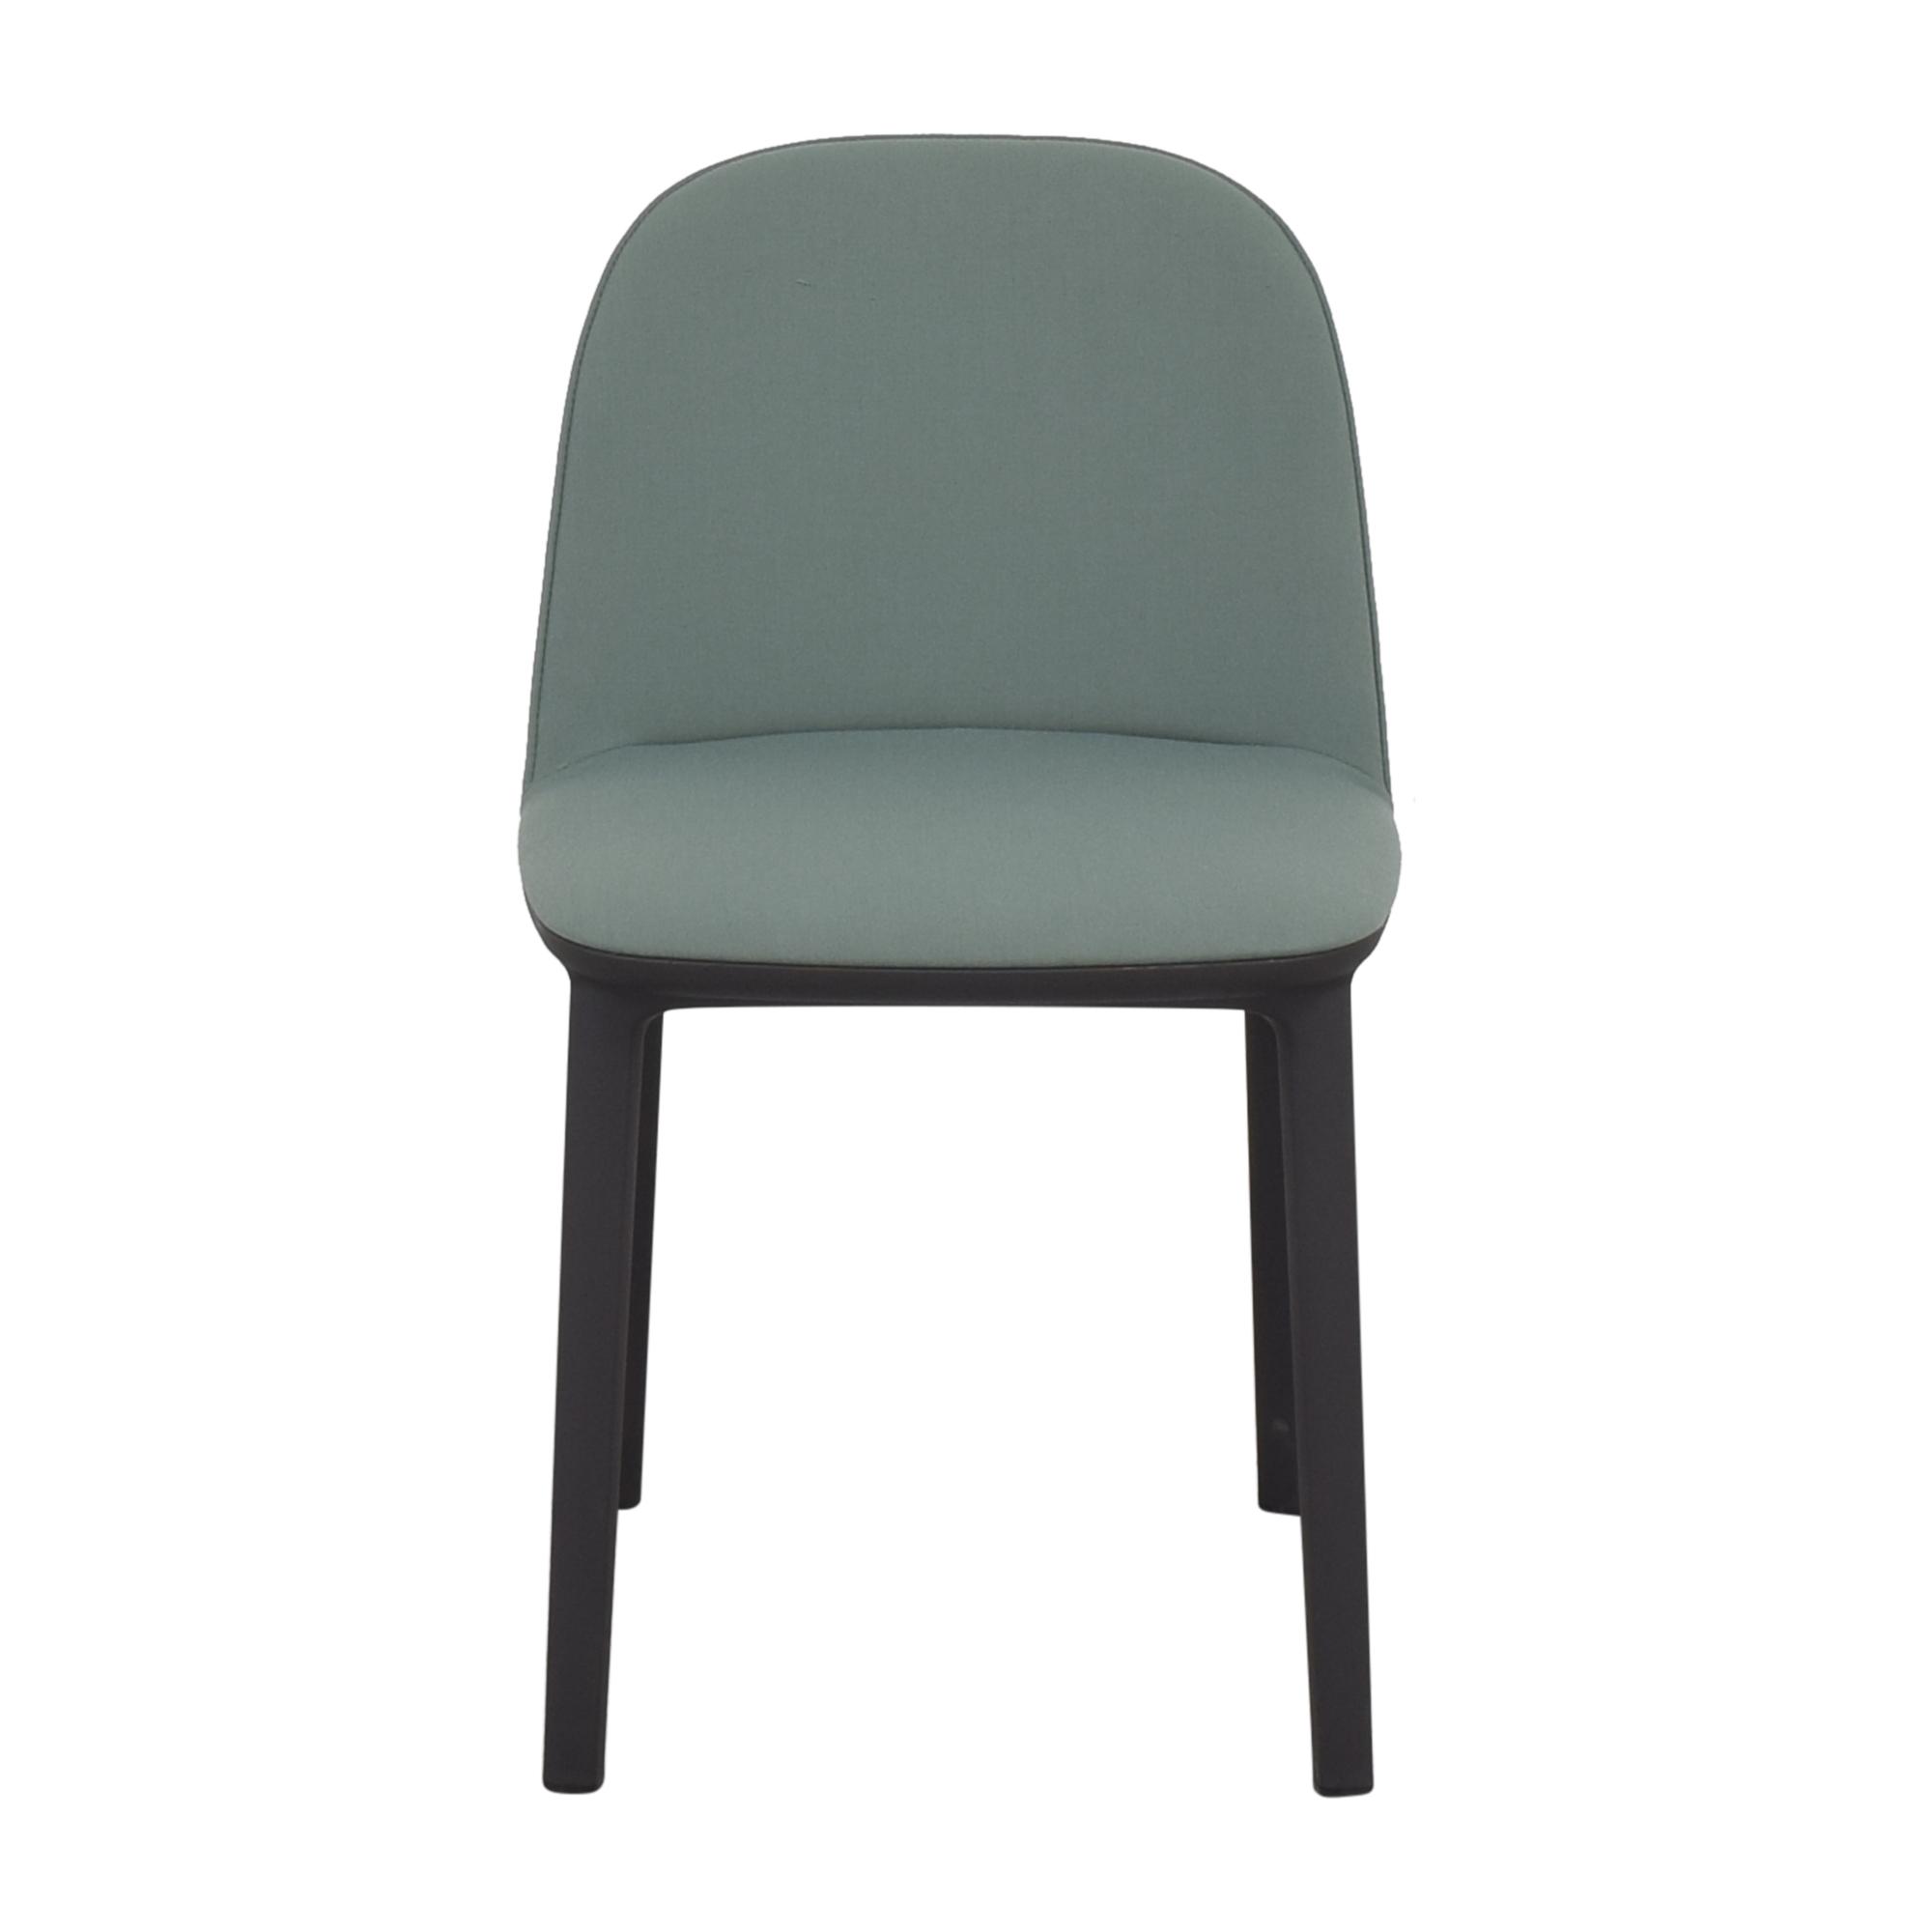 Vitra Vitra Softshell Side Chair Chairs